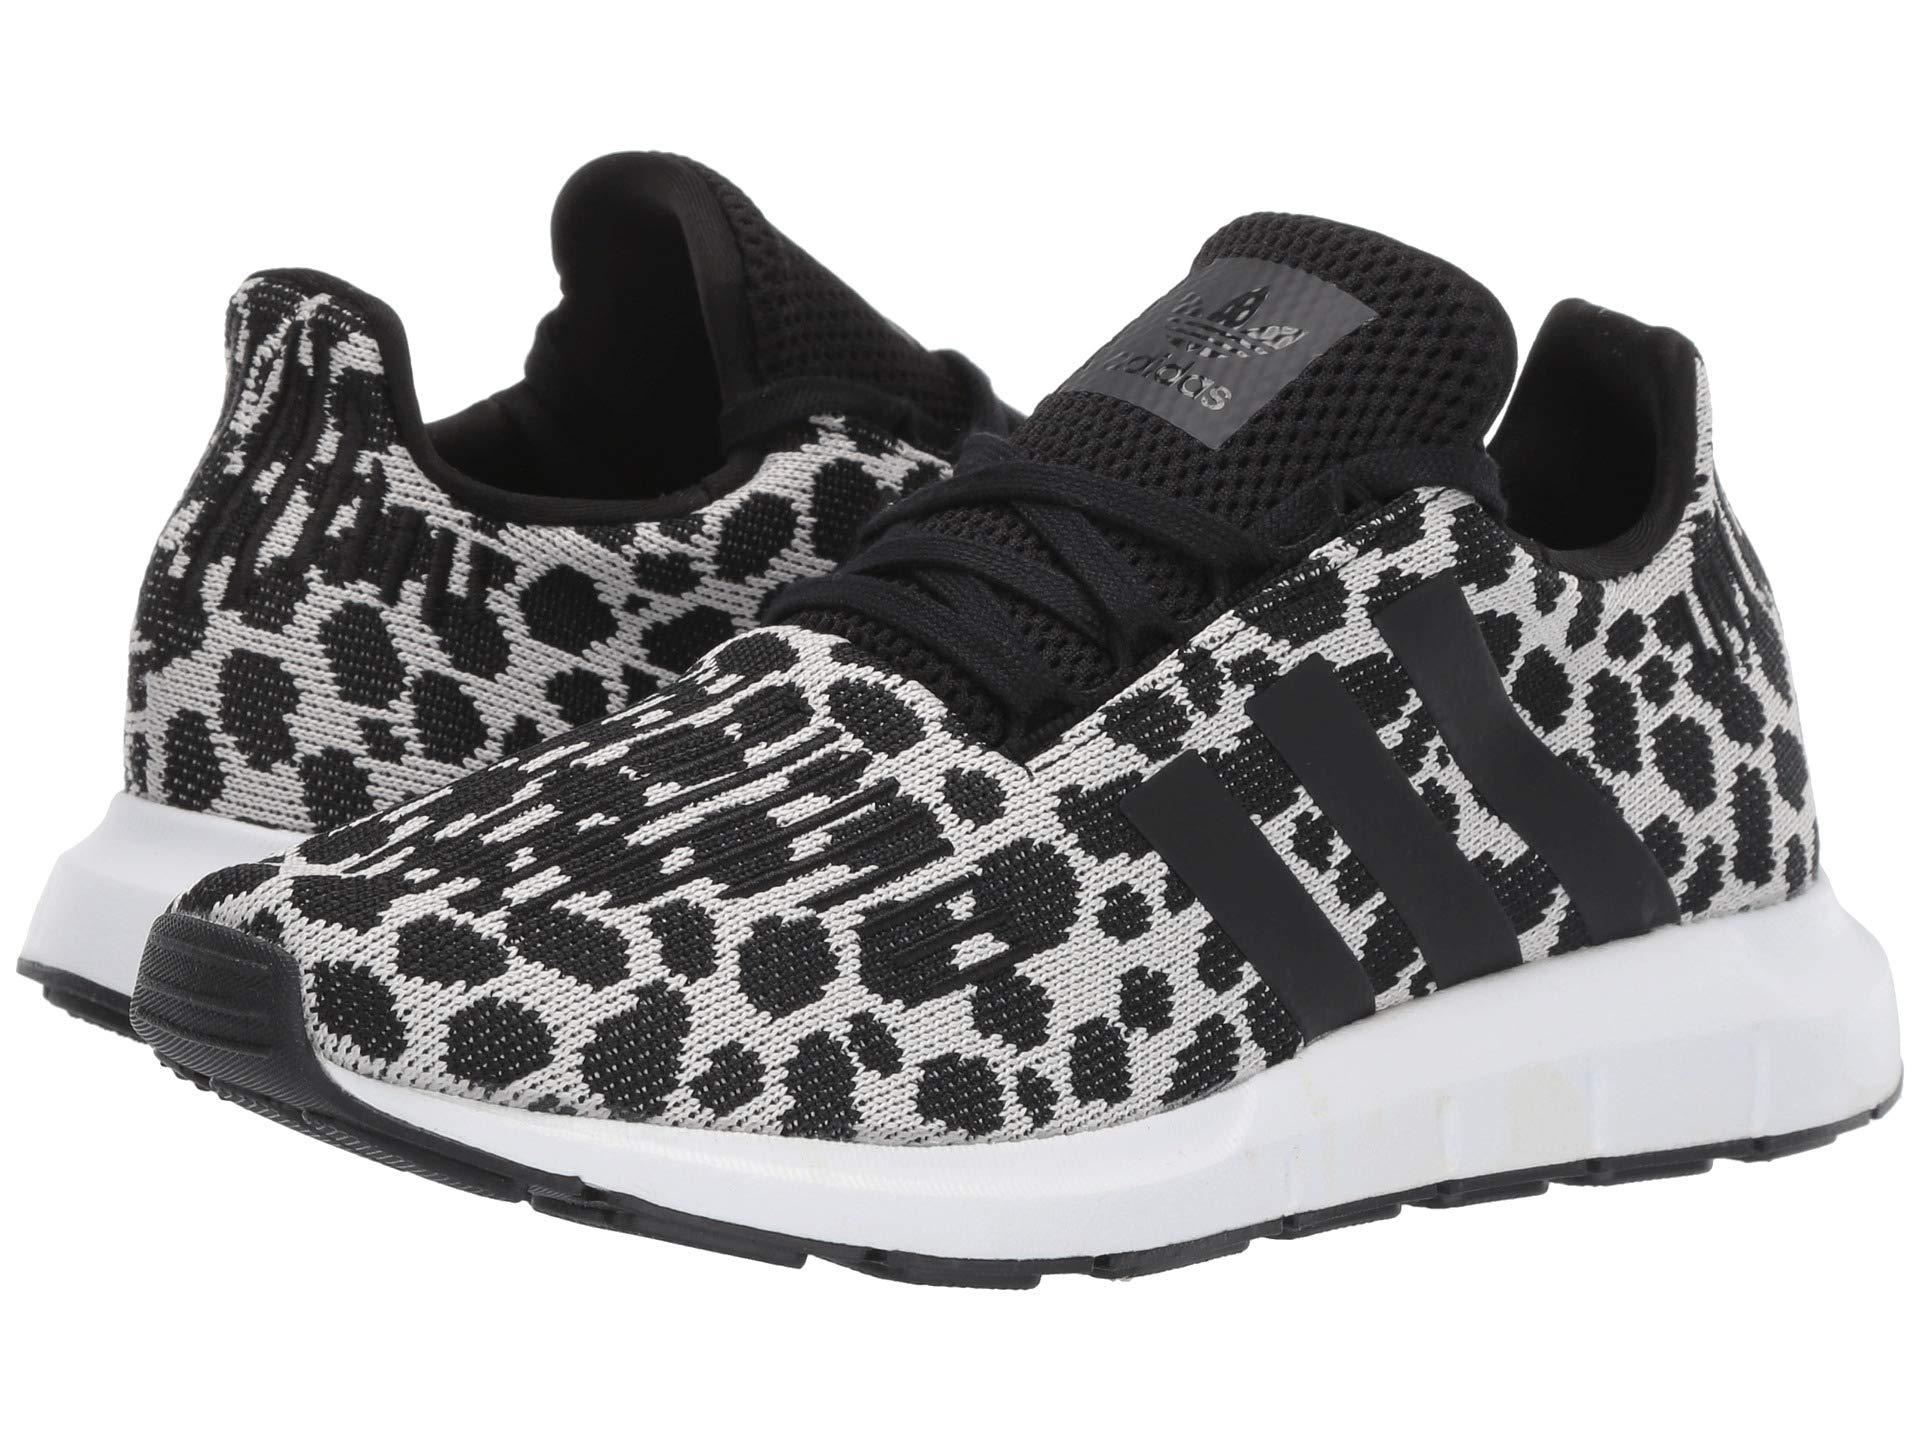 Adidas Originals Rubber Swift Run W Black Carbon White Women S Shoes Lyst